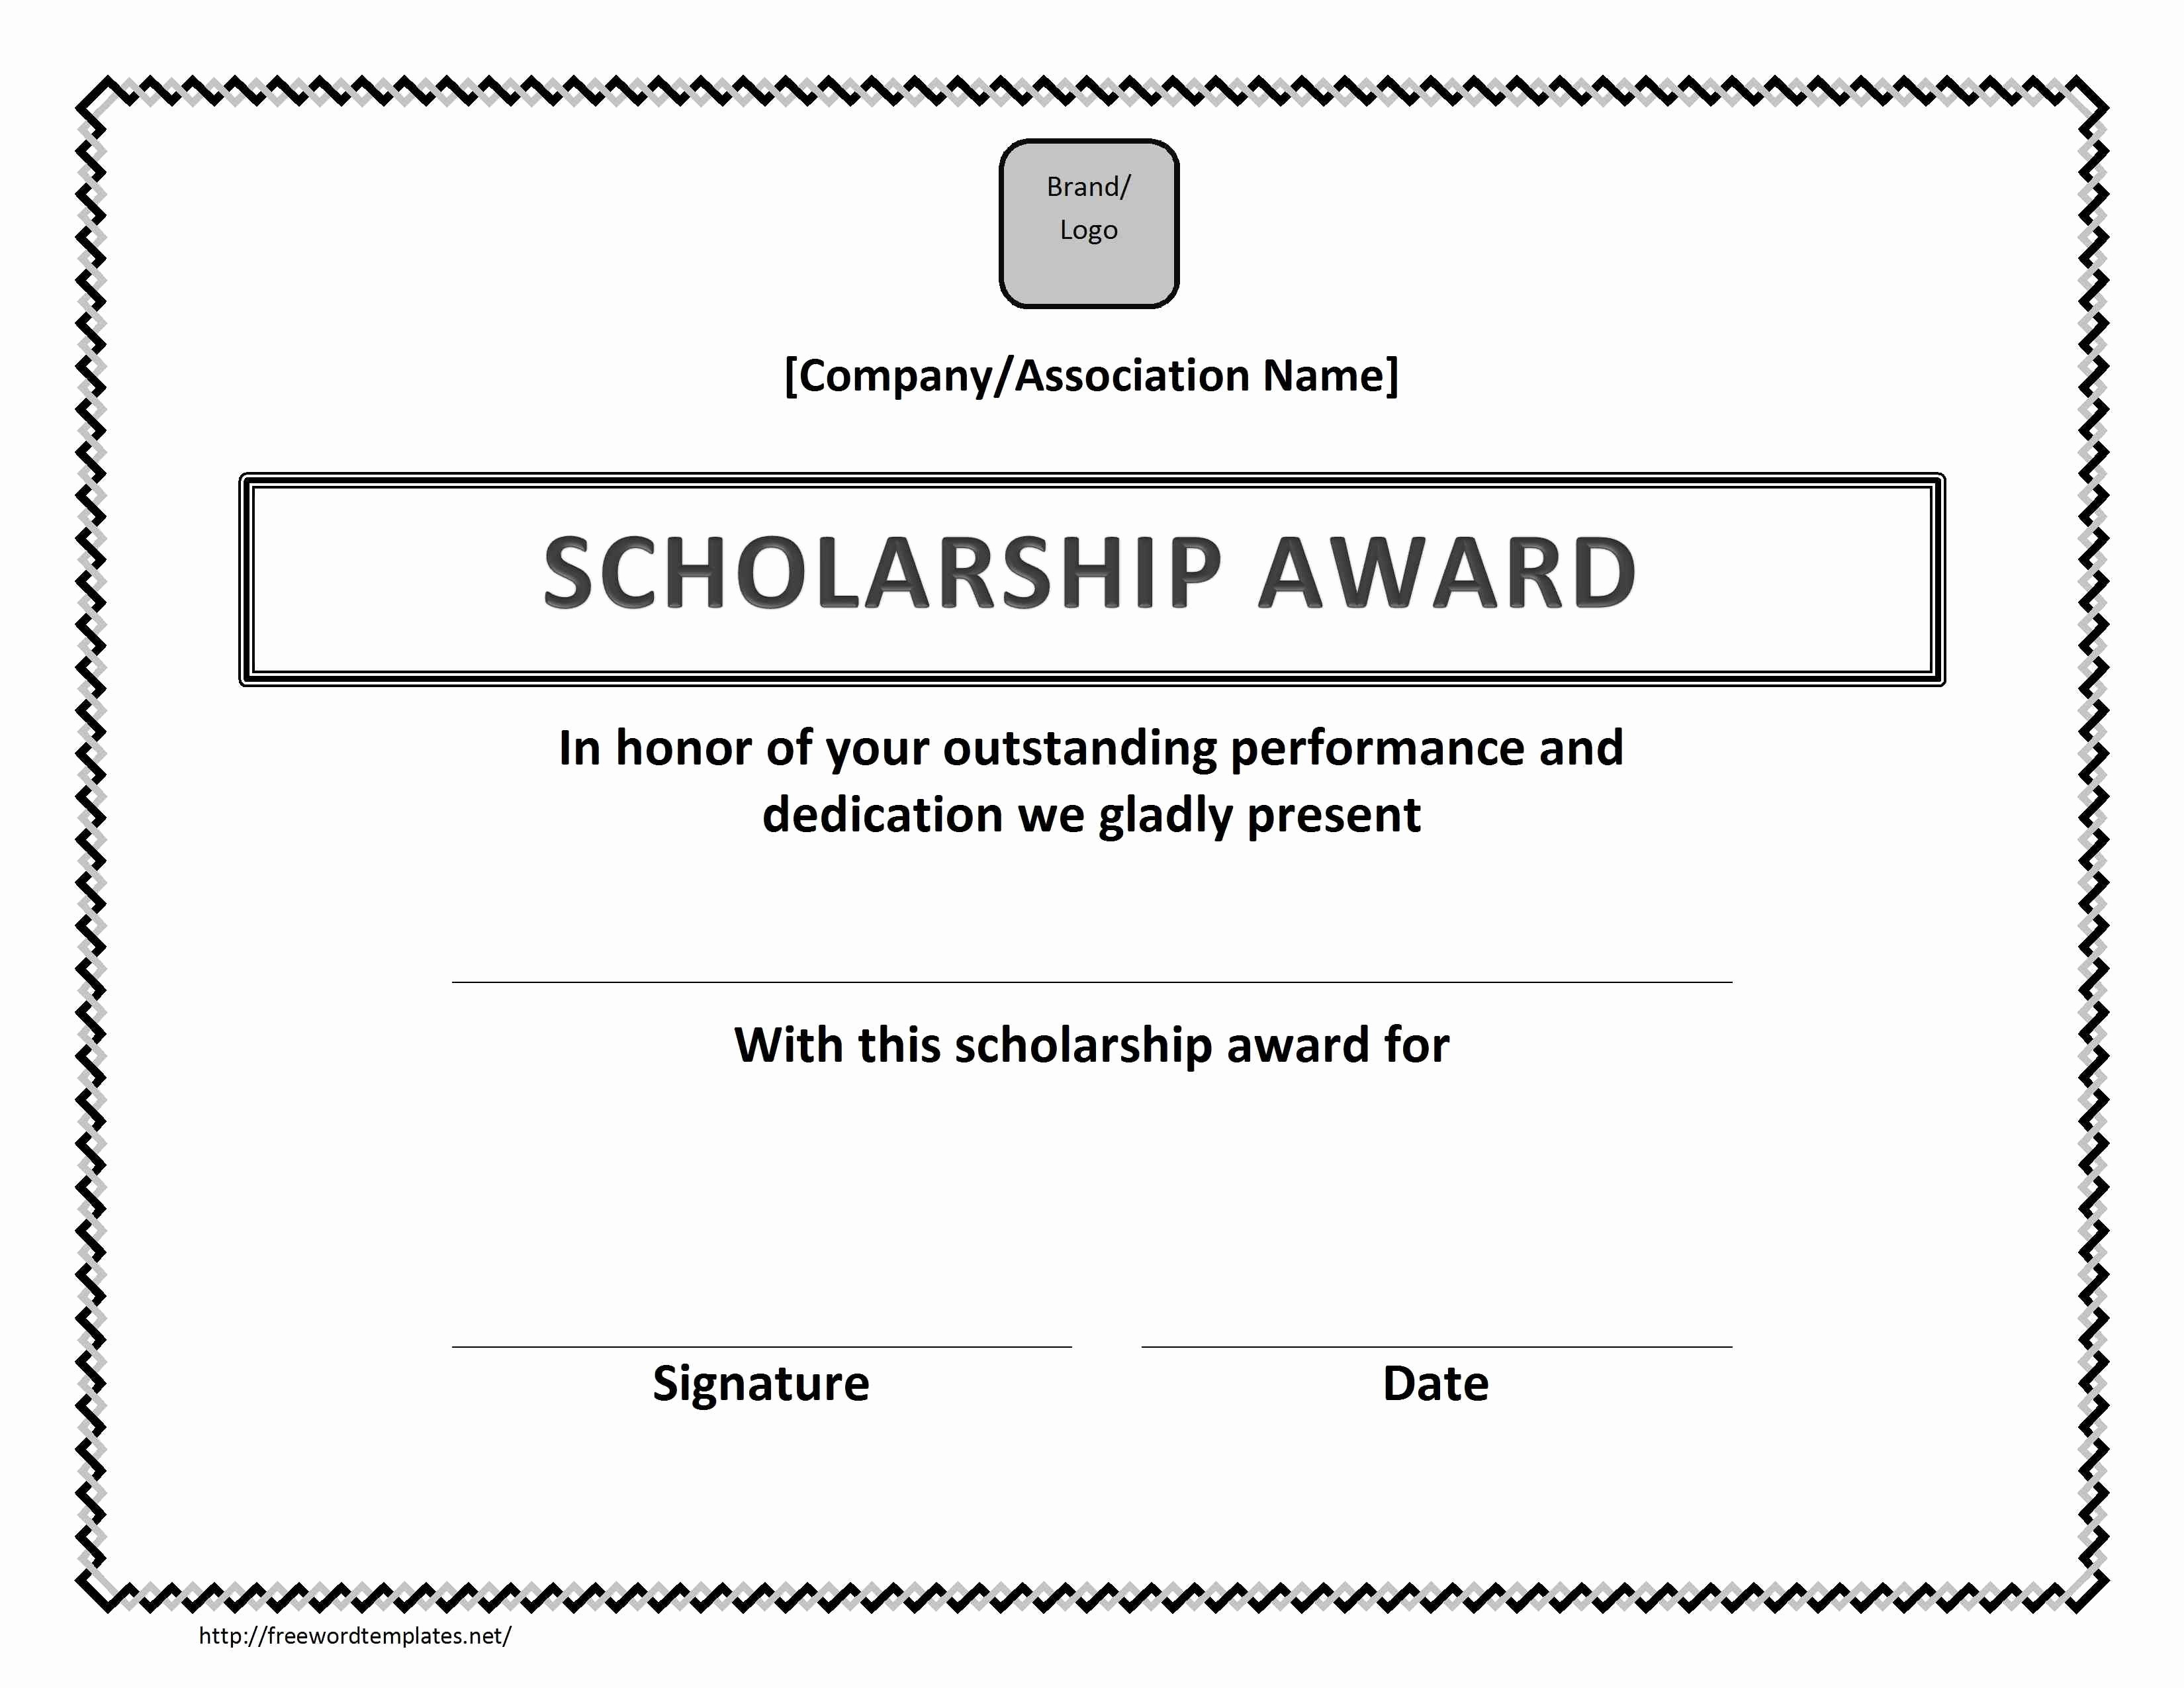 Microsoft Office Award Certificate Template Awesome Scholarship Award Certificate Template